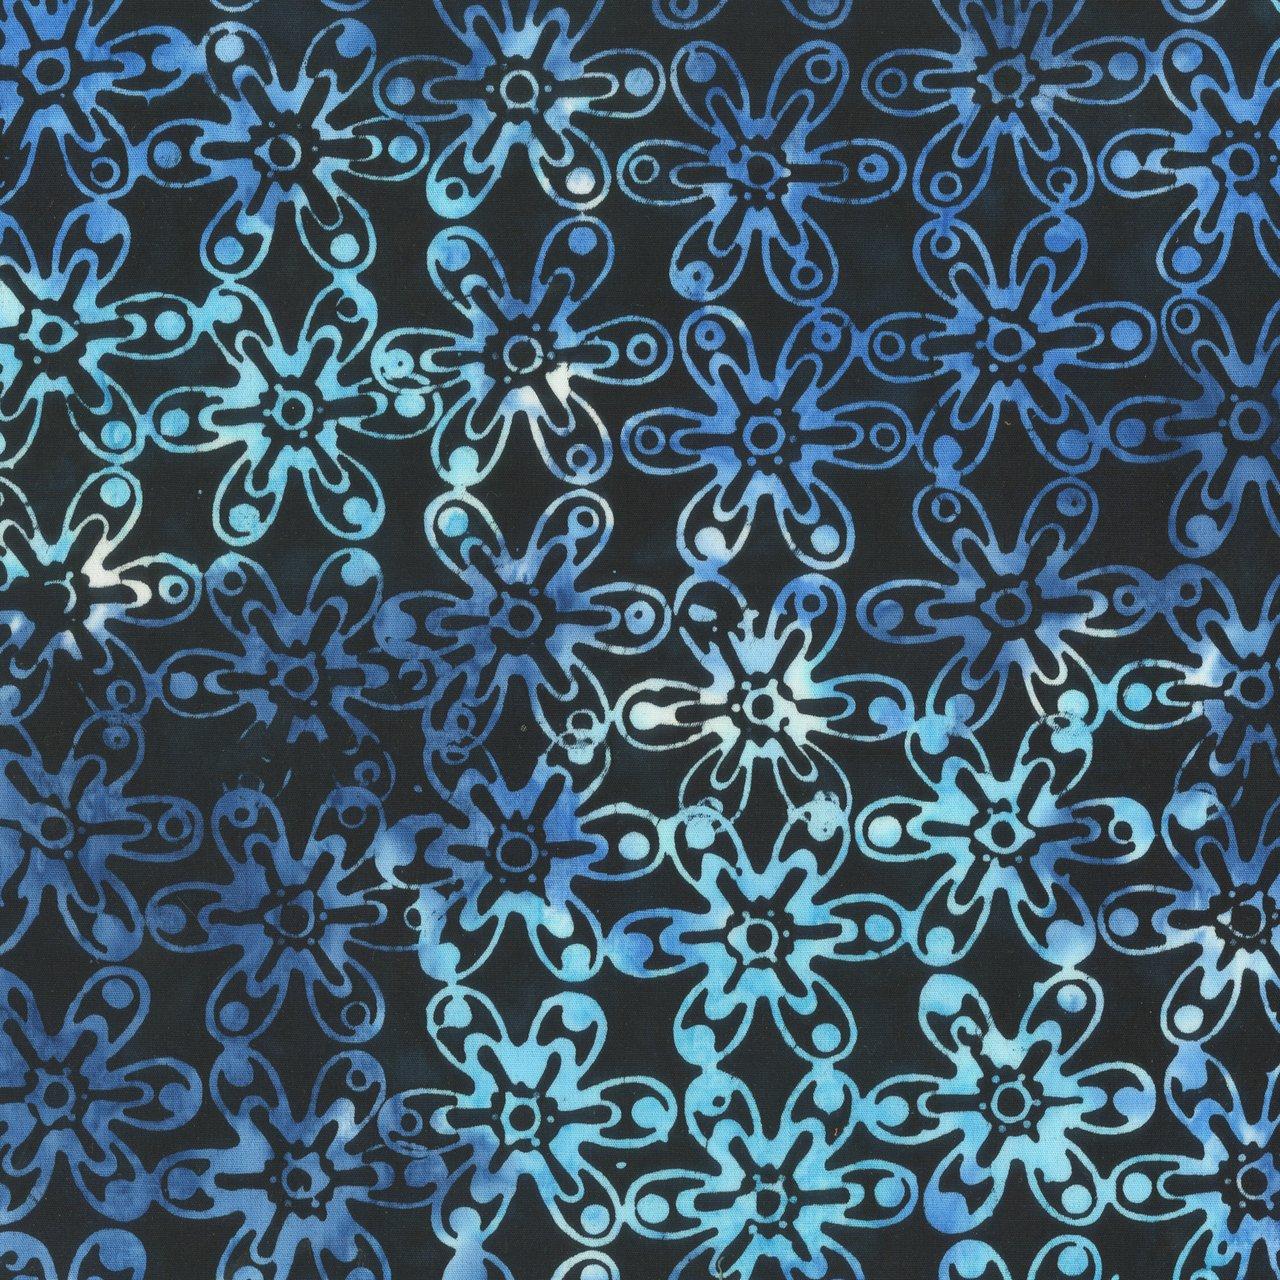 342Q-8 Sky by Jacqueline De Jonge for Anthology Fabrics